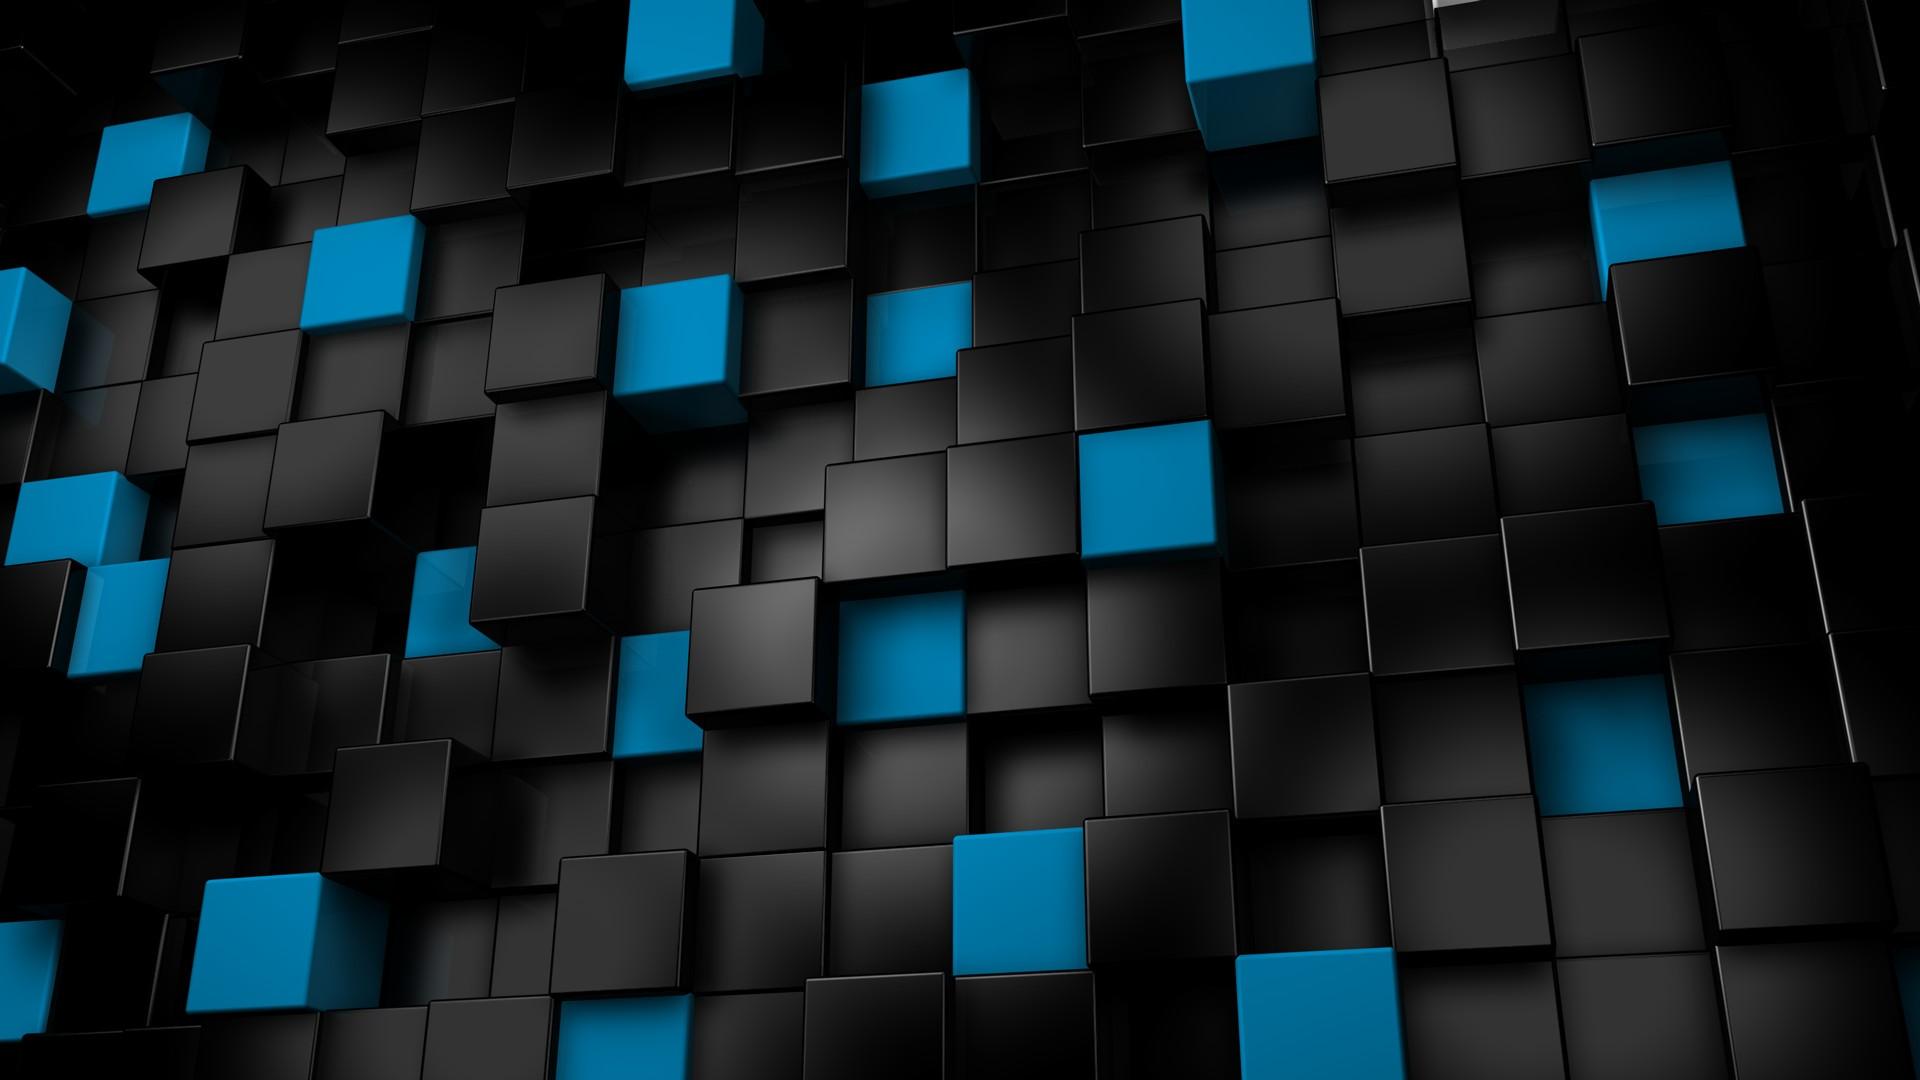 Android Wallpaper Desktop #h735397 | Computers HD Wallpaper